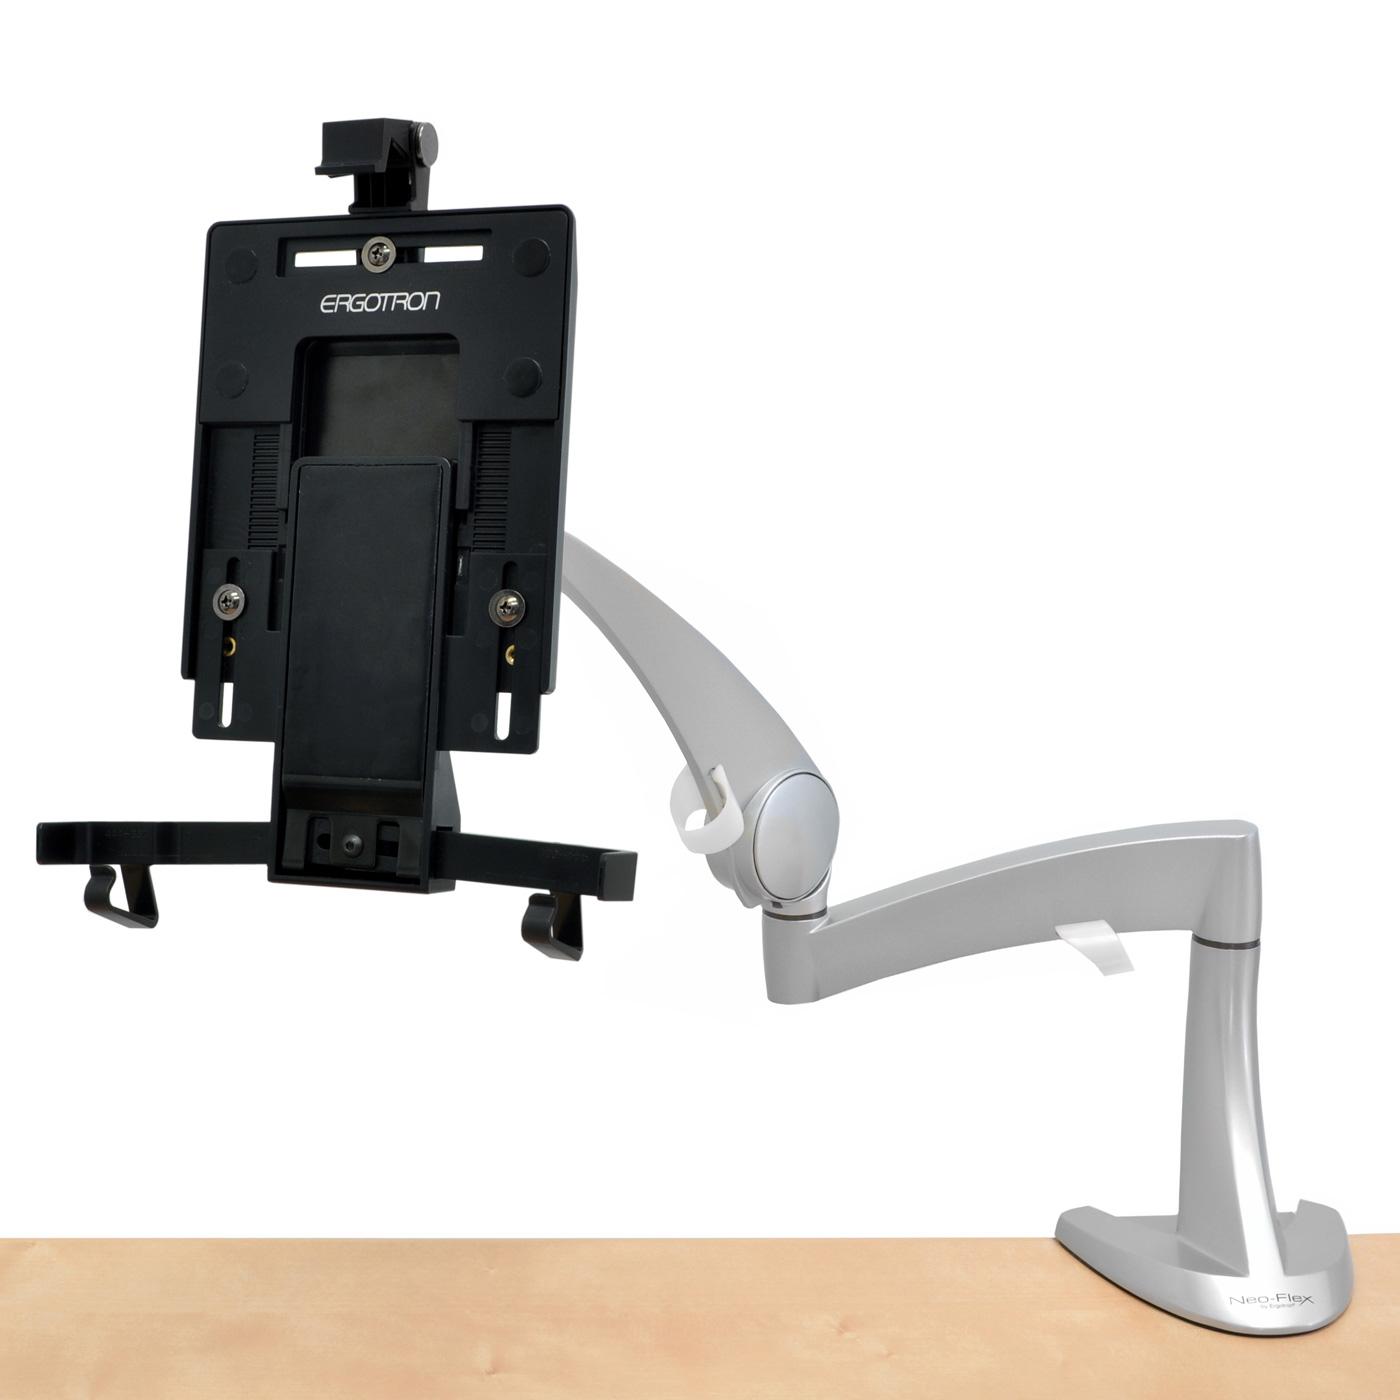 Ergotron Universal Tablet Cradle Bras Pied Ergotron